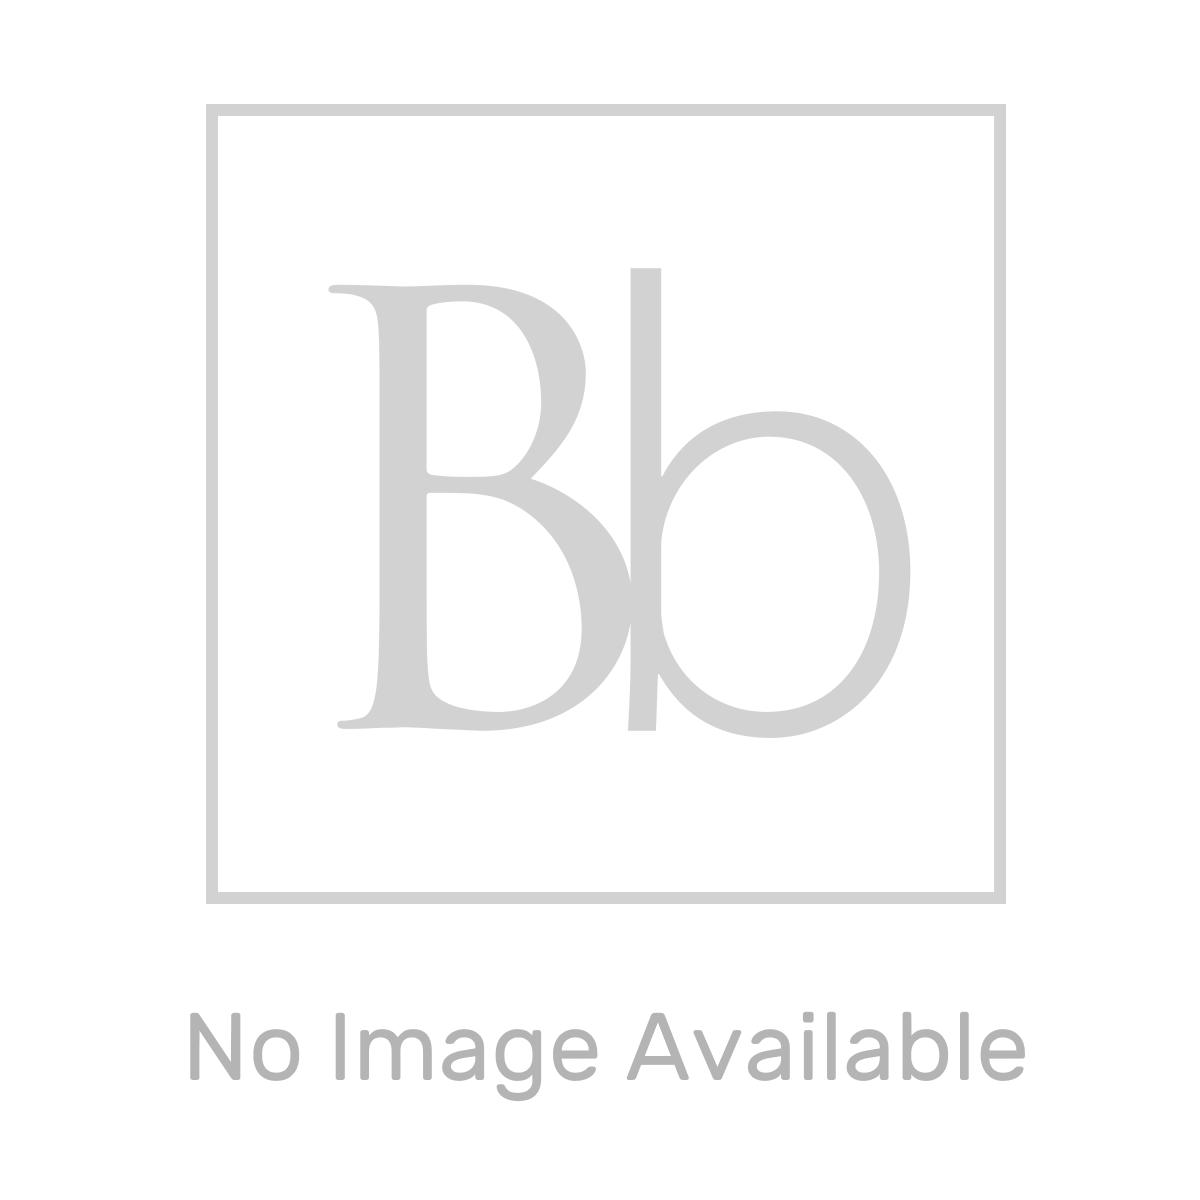 Sanicondens Pro Water Vapour Condenser